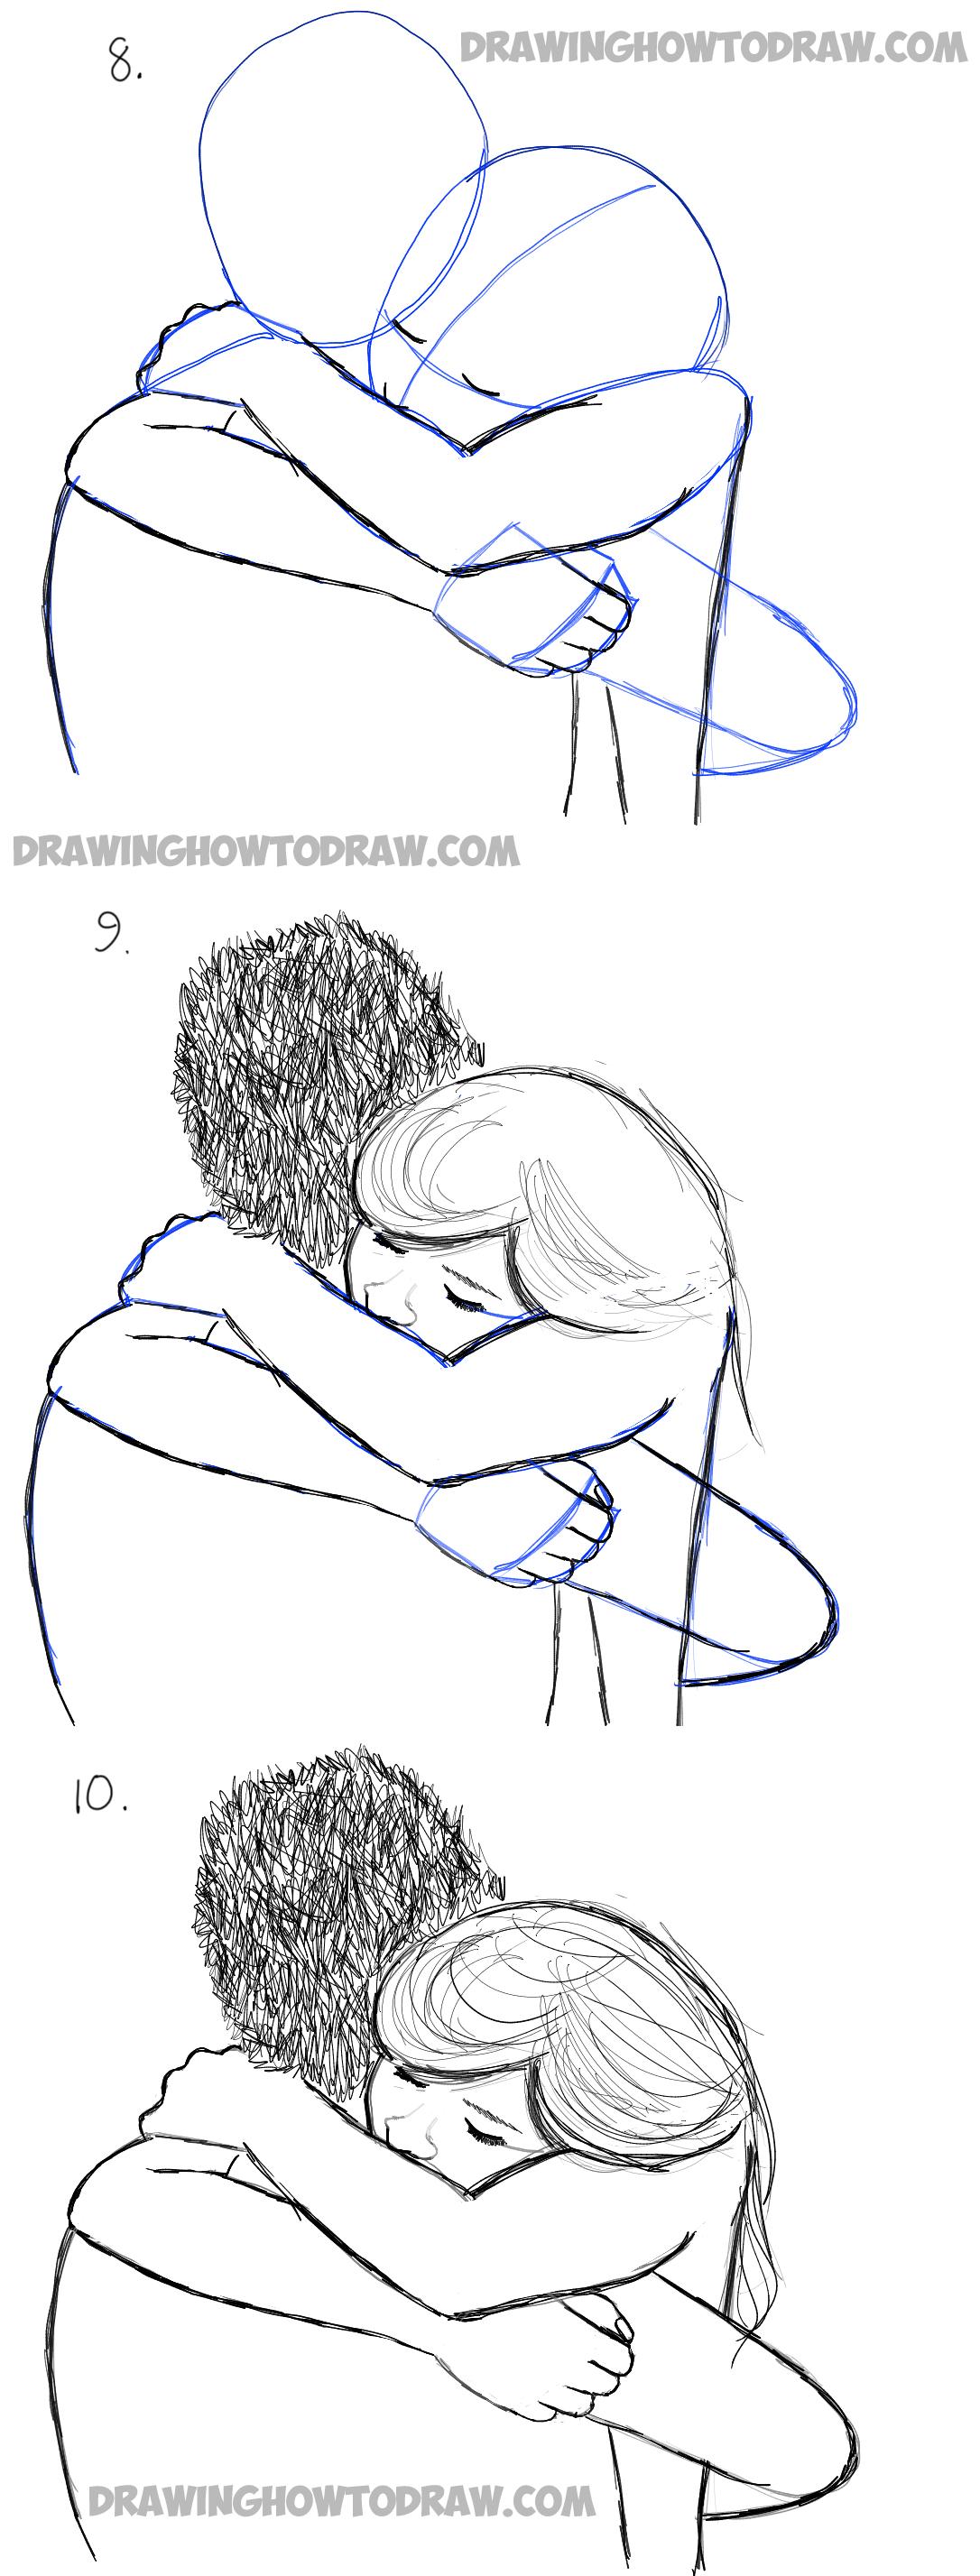 Drawn hug easy  The Tips 15 to